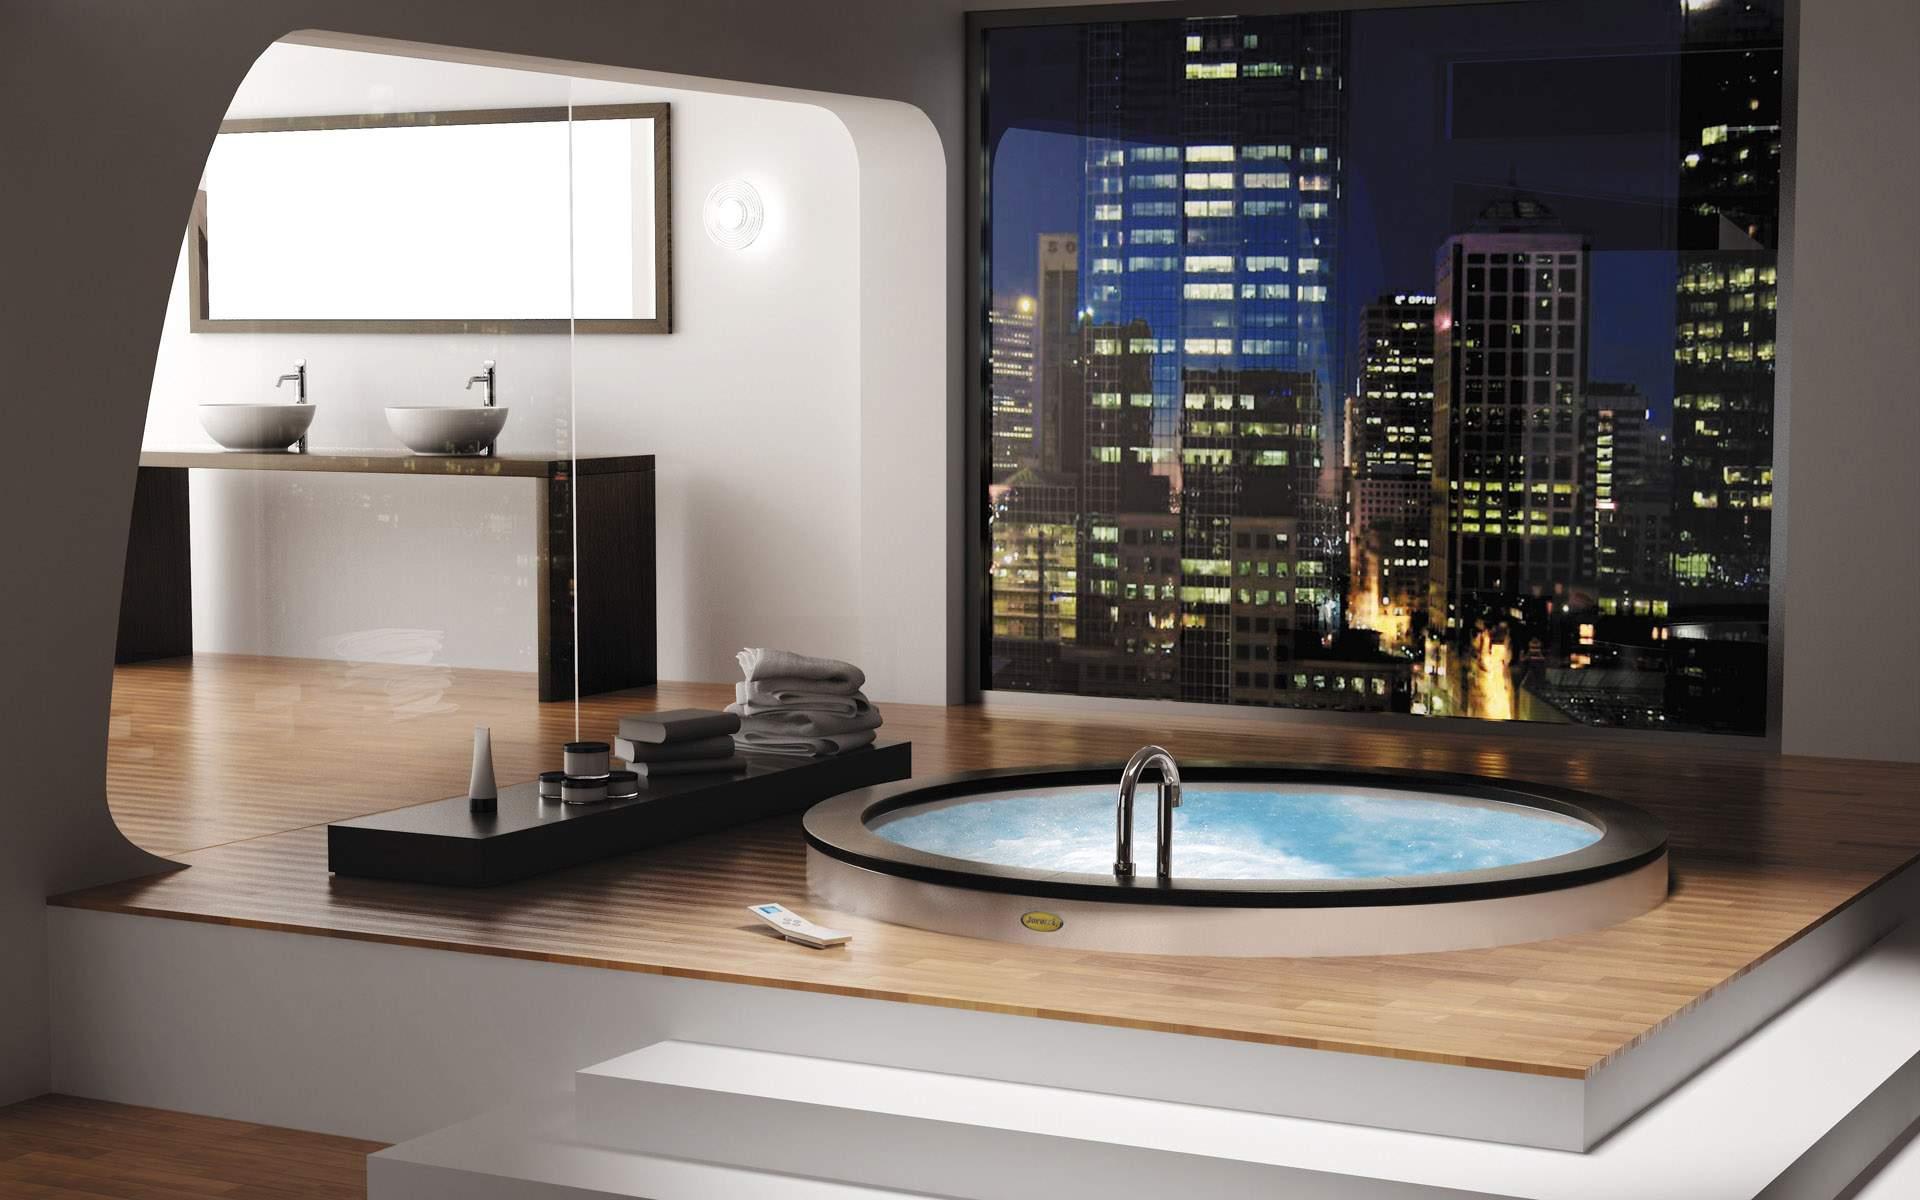 bath-hd-wallpaper